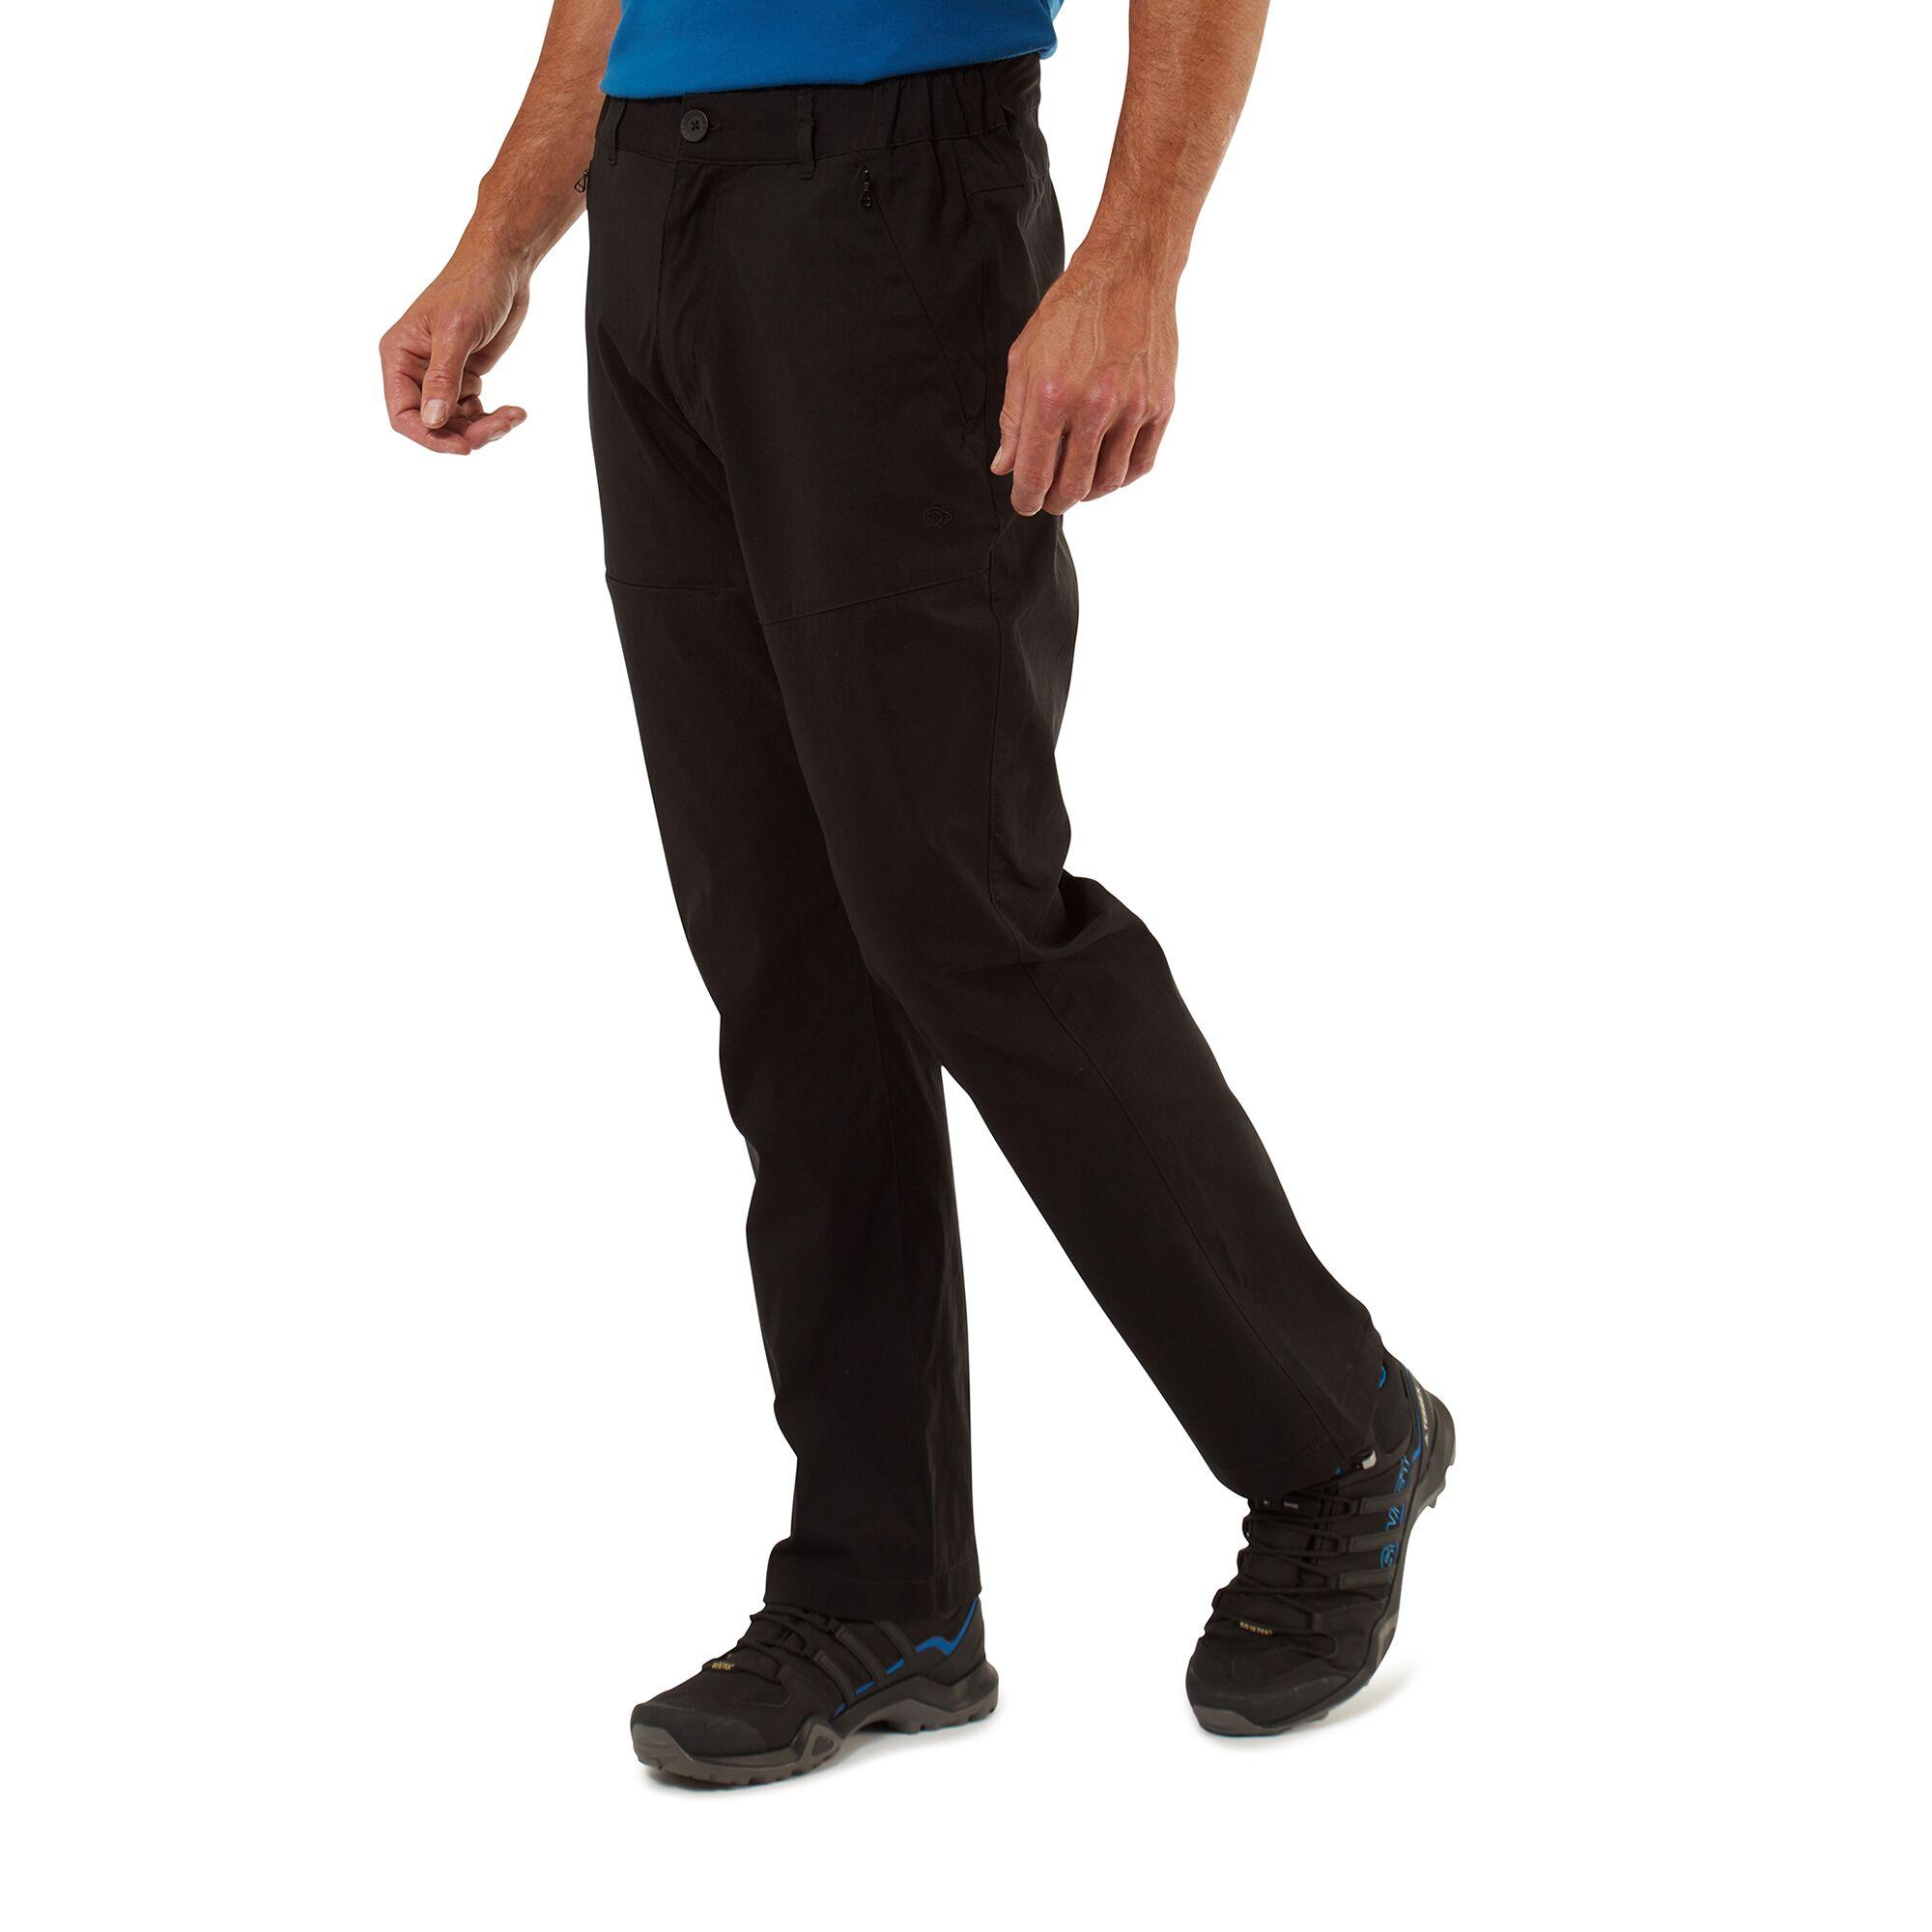 Craghoppers Mens Classic Kiwi Trousers - Bark - 32s